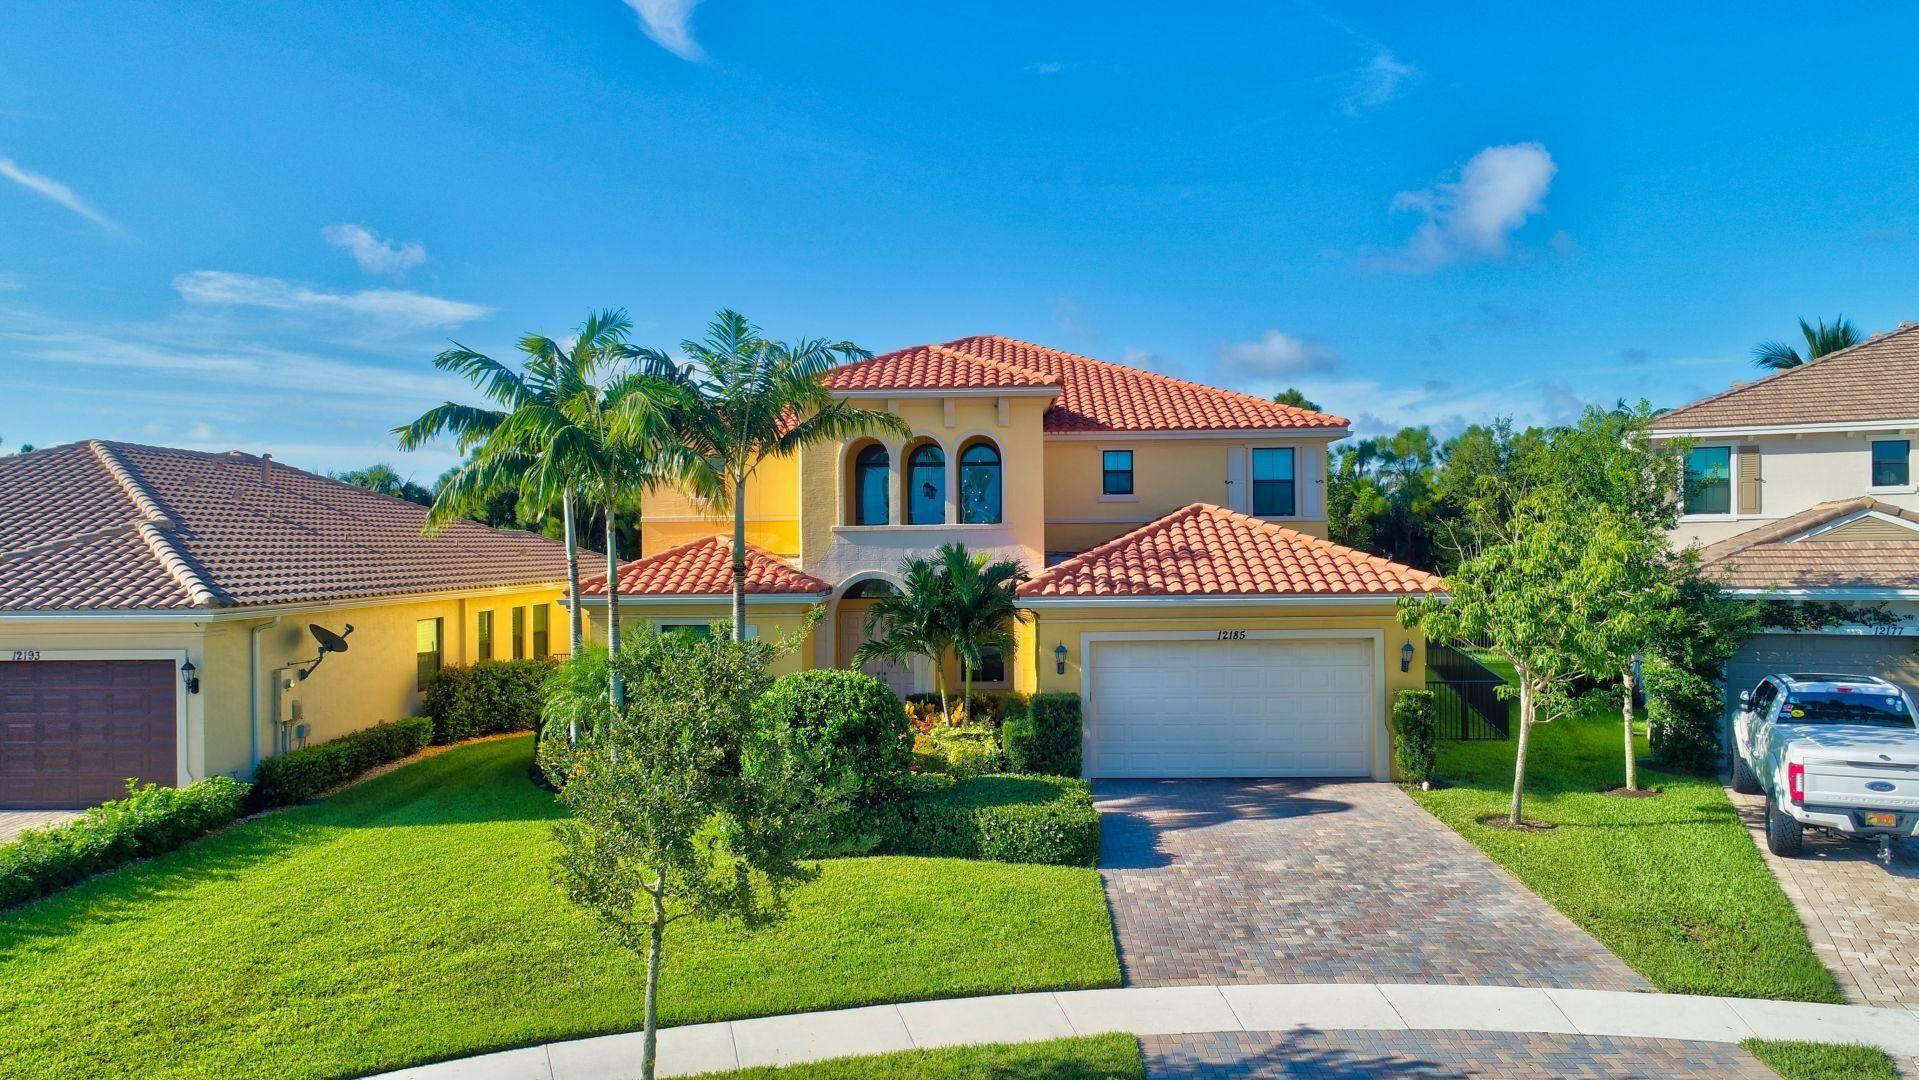 12185 Boca Reserve Lane, Boca Raton, FL 33428 - #: RX-10629095